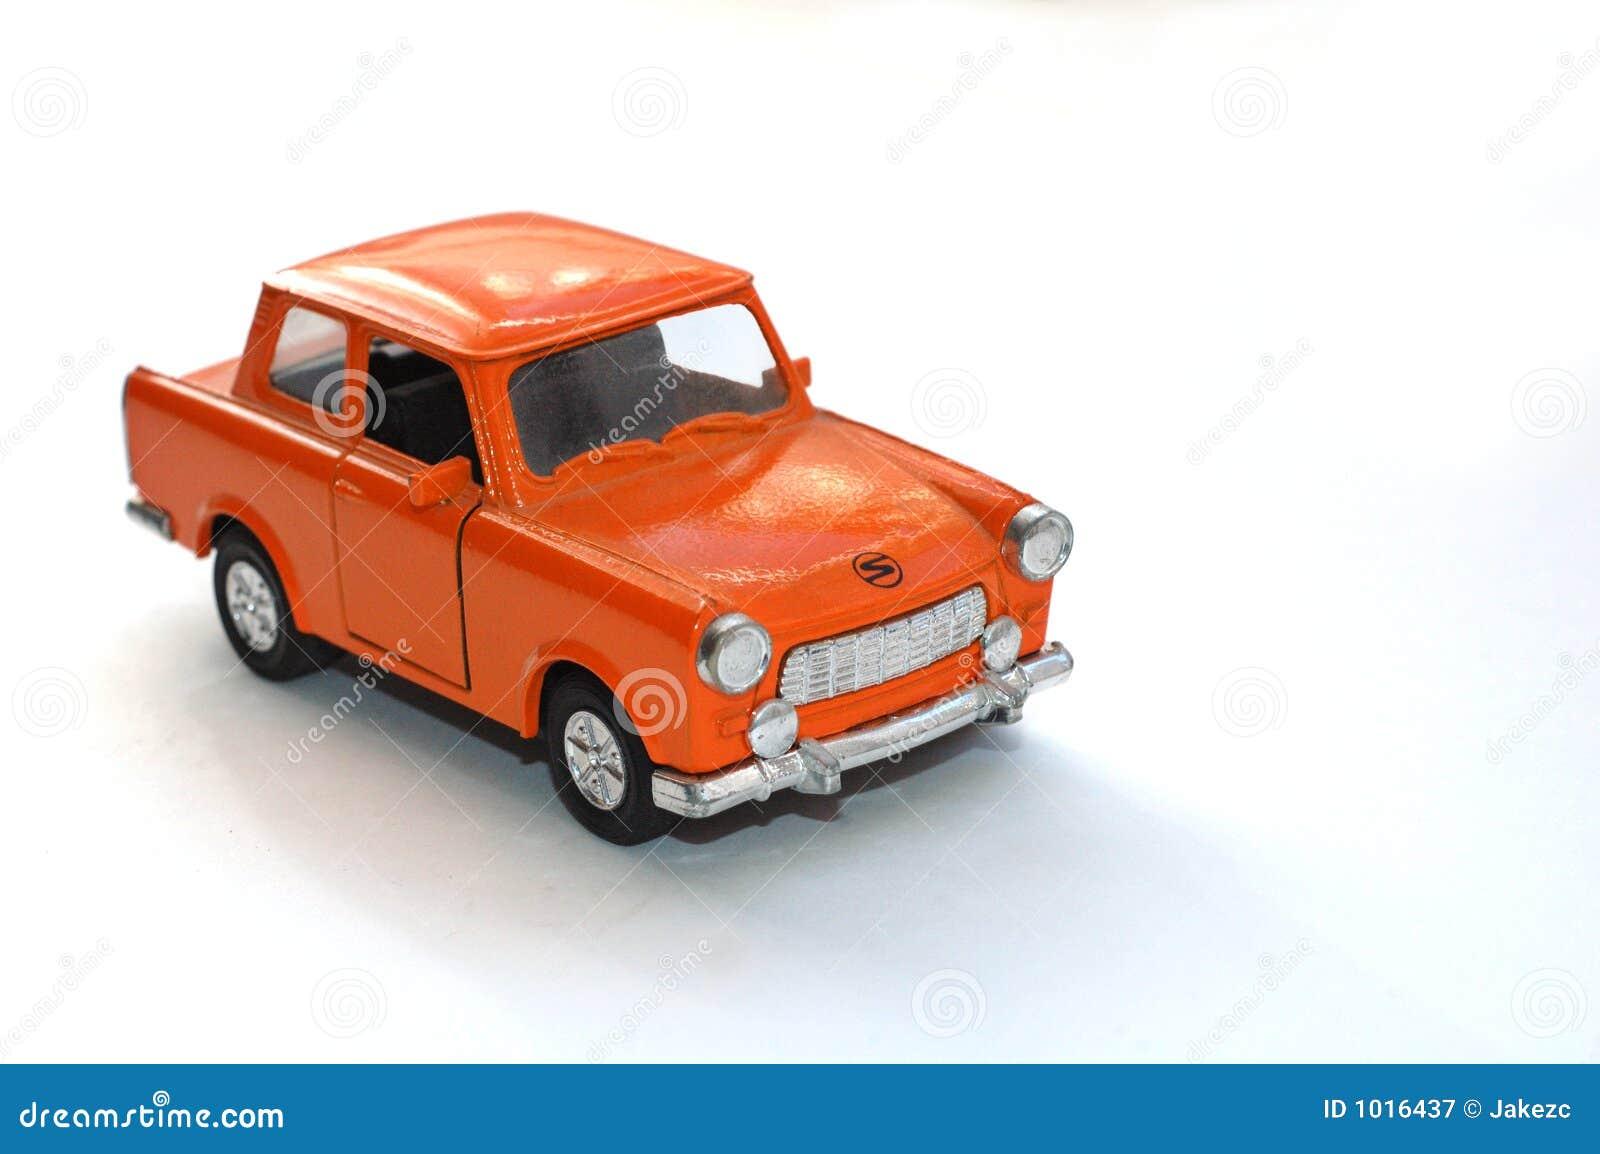 Orange auto spielzeug stockbild bild von dekorativ